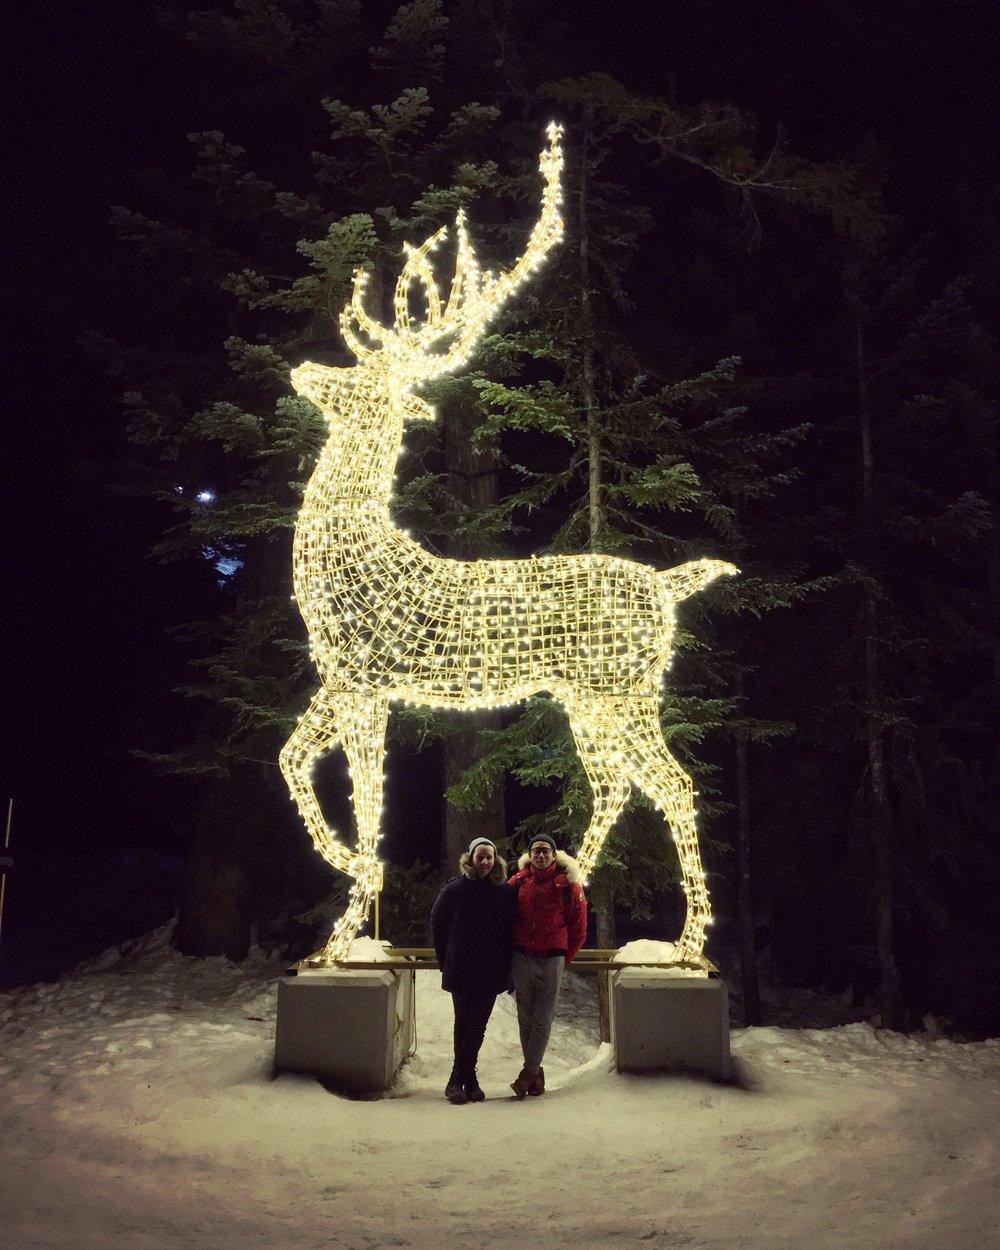 We wish you a Merry Christmas / Bon Nadal / Feliz Navidad / 聖誕節快樂 / Joyeux Noël from the peak of Vancouver 🦌